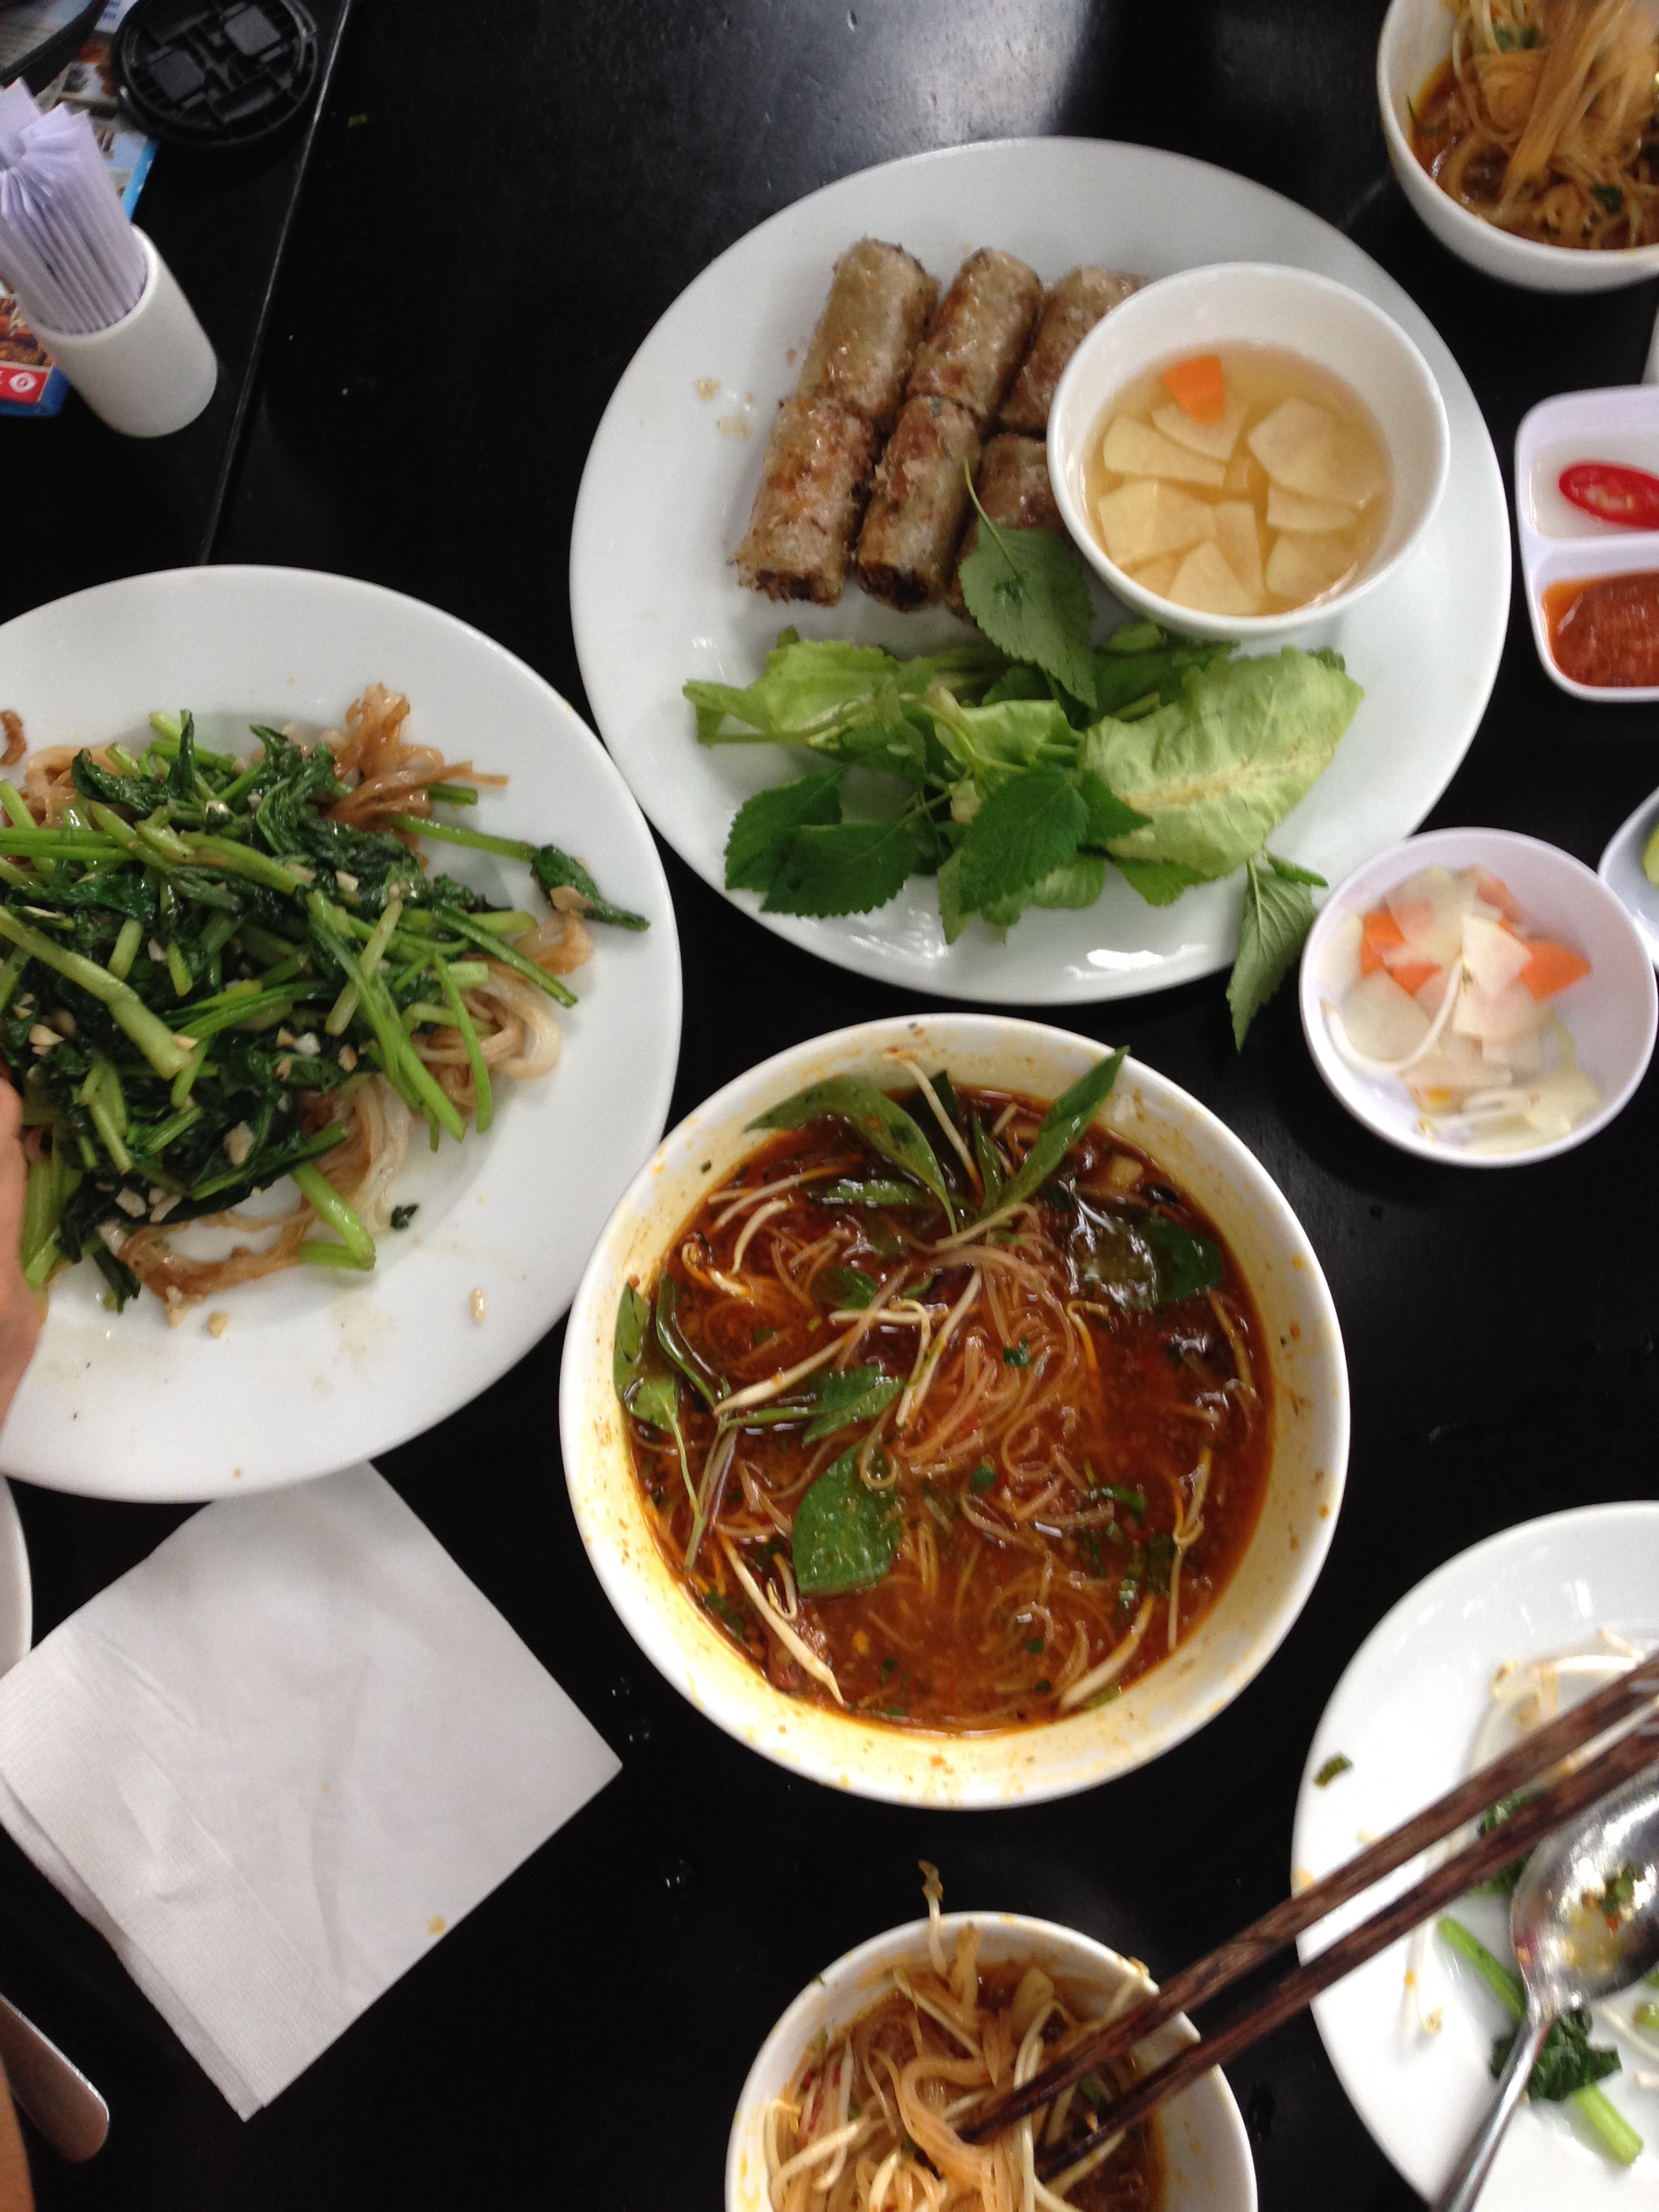 Delicious Vietnamese meal - flatlay - illumelation.com